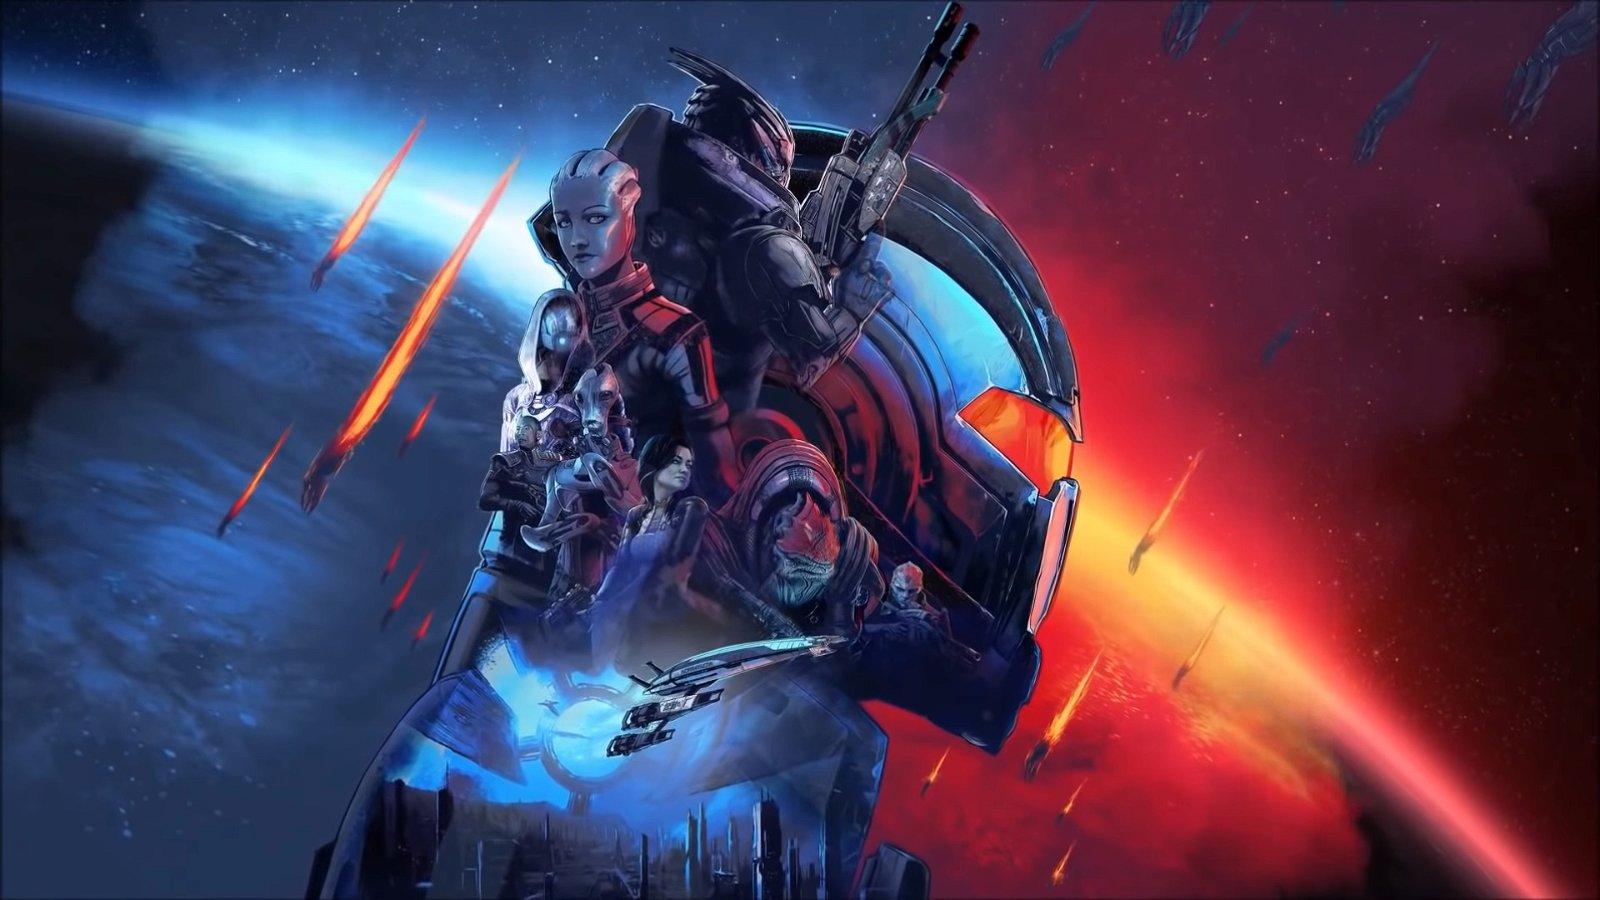 Mass Effect Legendary Edition Arrives May 14